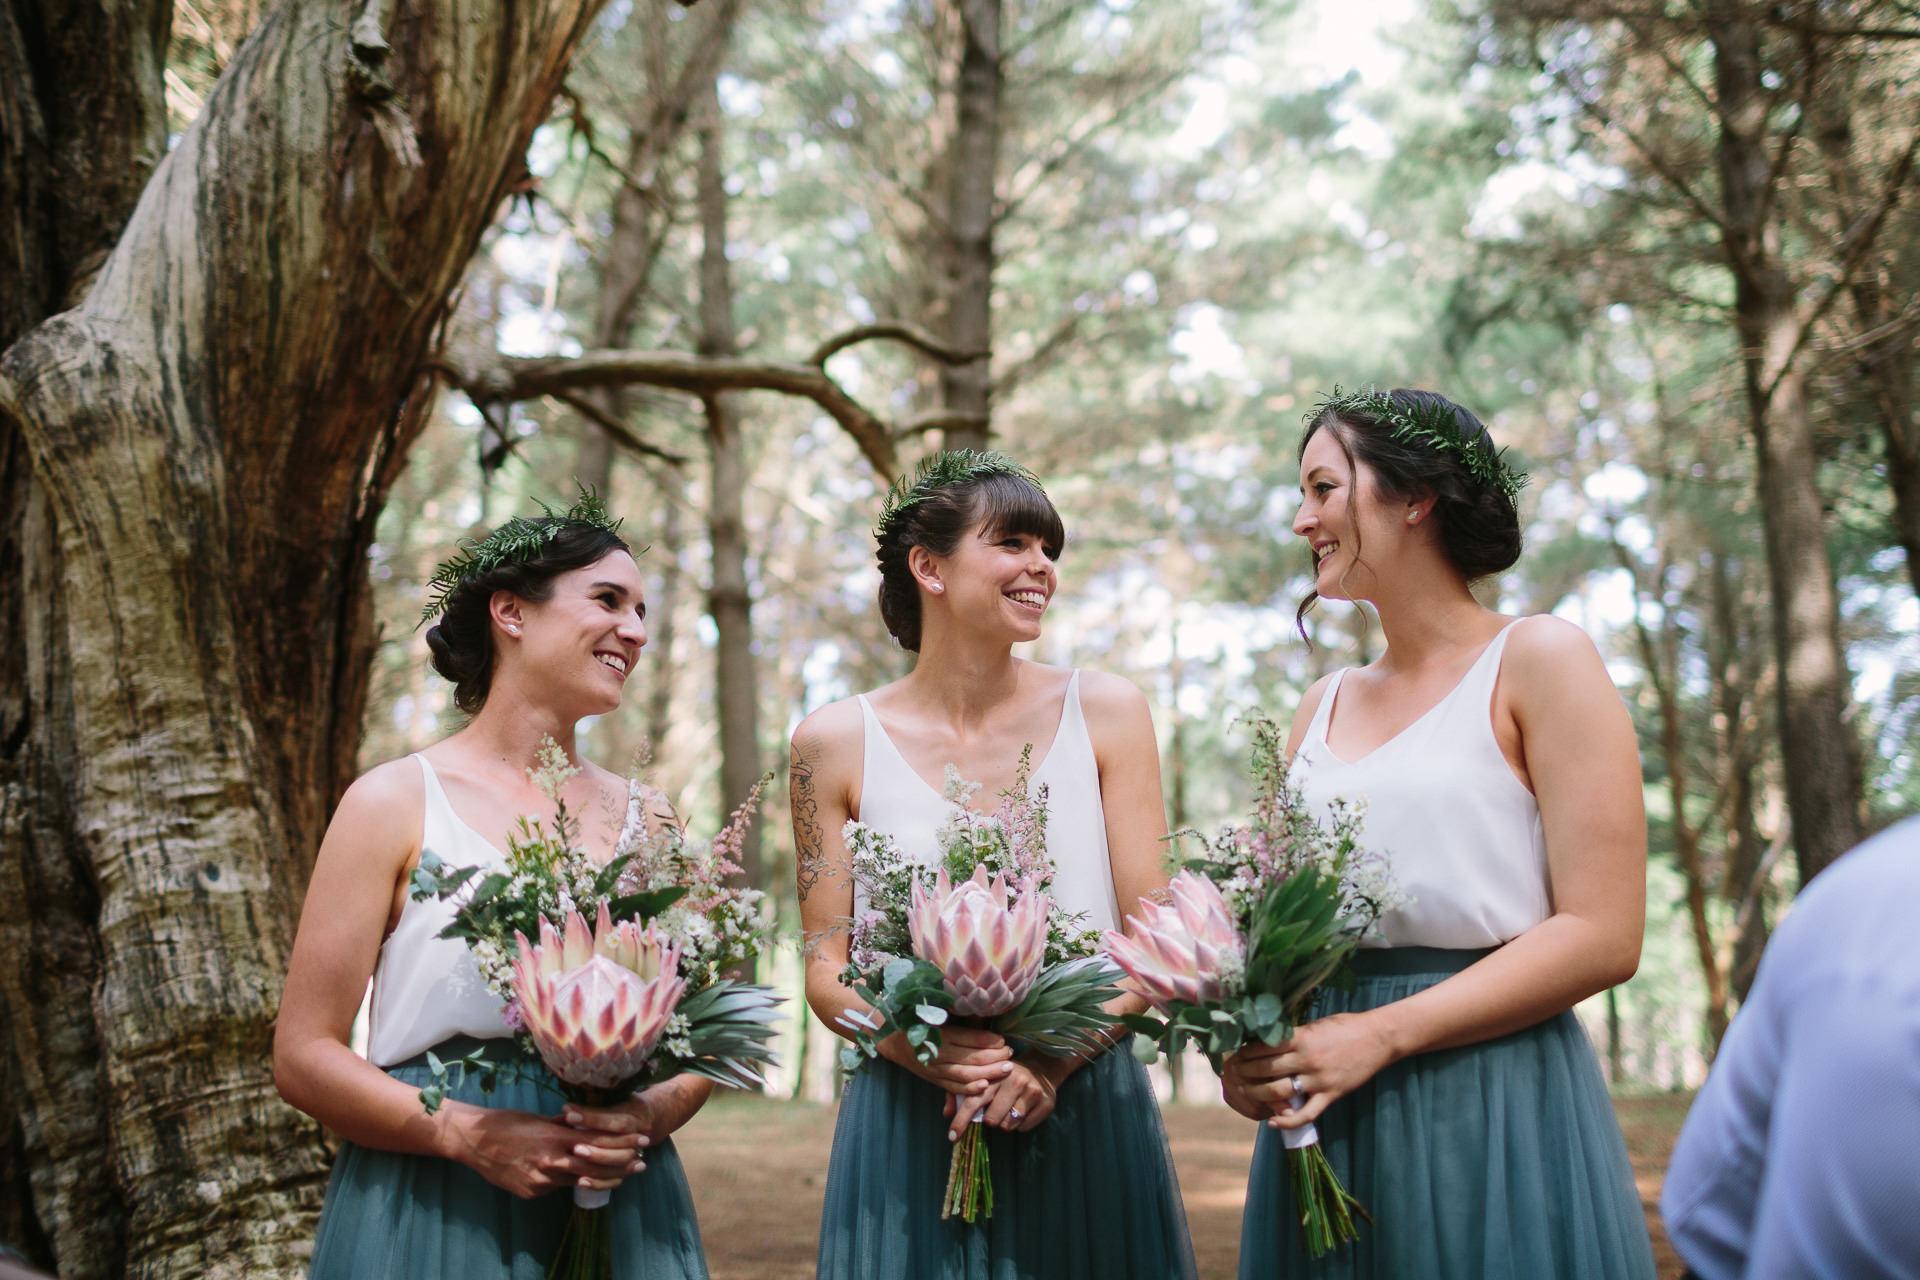 Happy bridesmaids in Kuitpo forrest